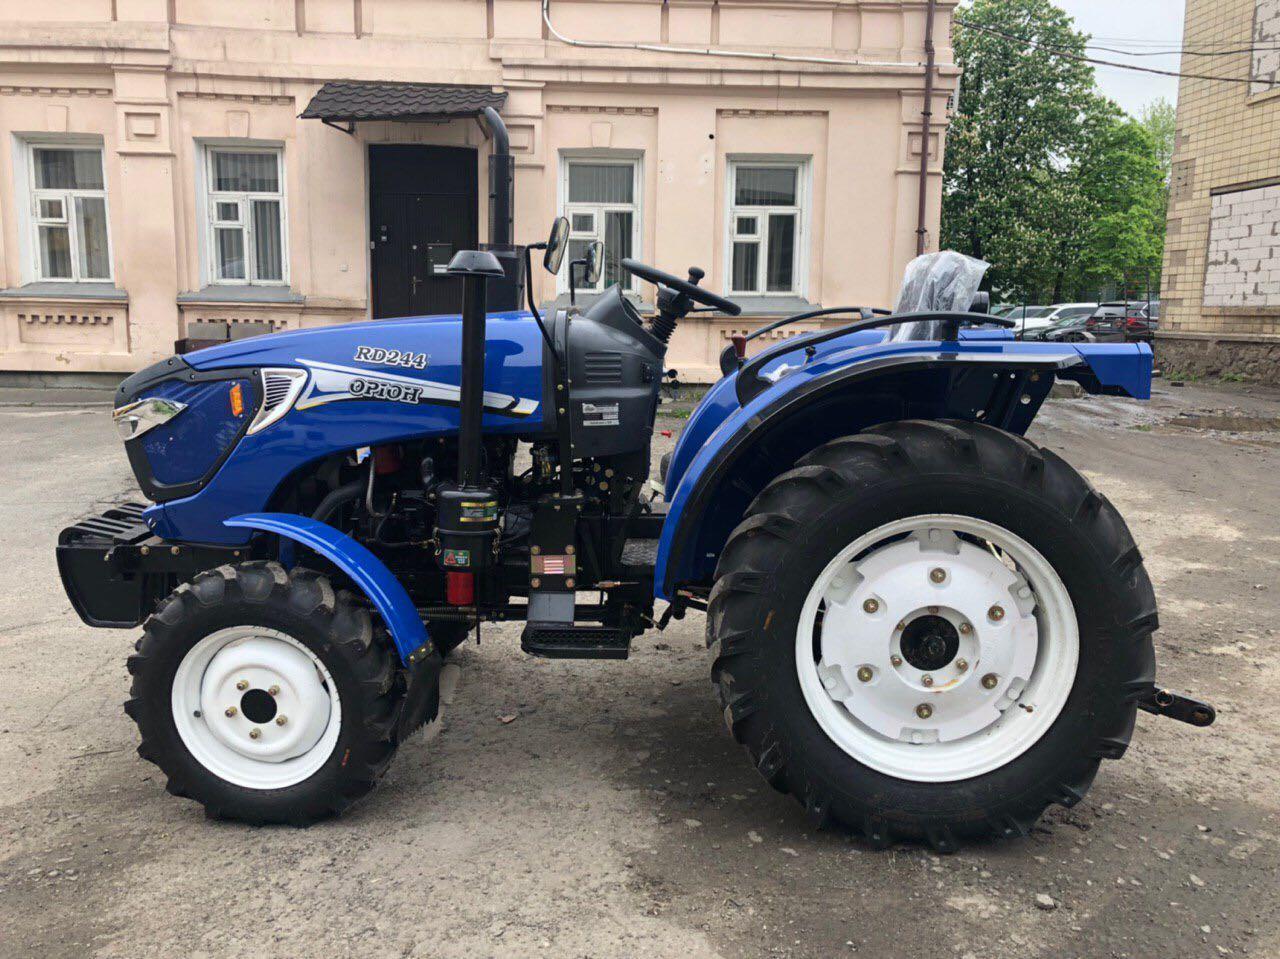 Мини-трактор Орион RD-244 - реверс КПП, широкая резина